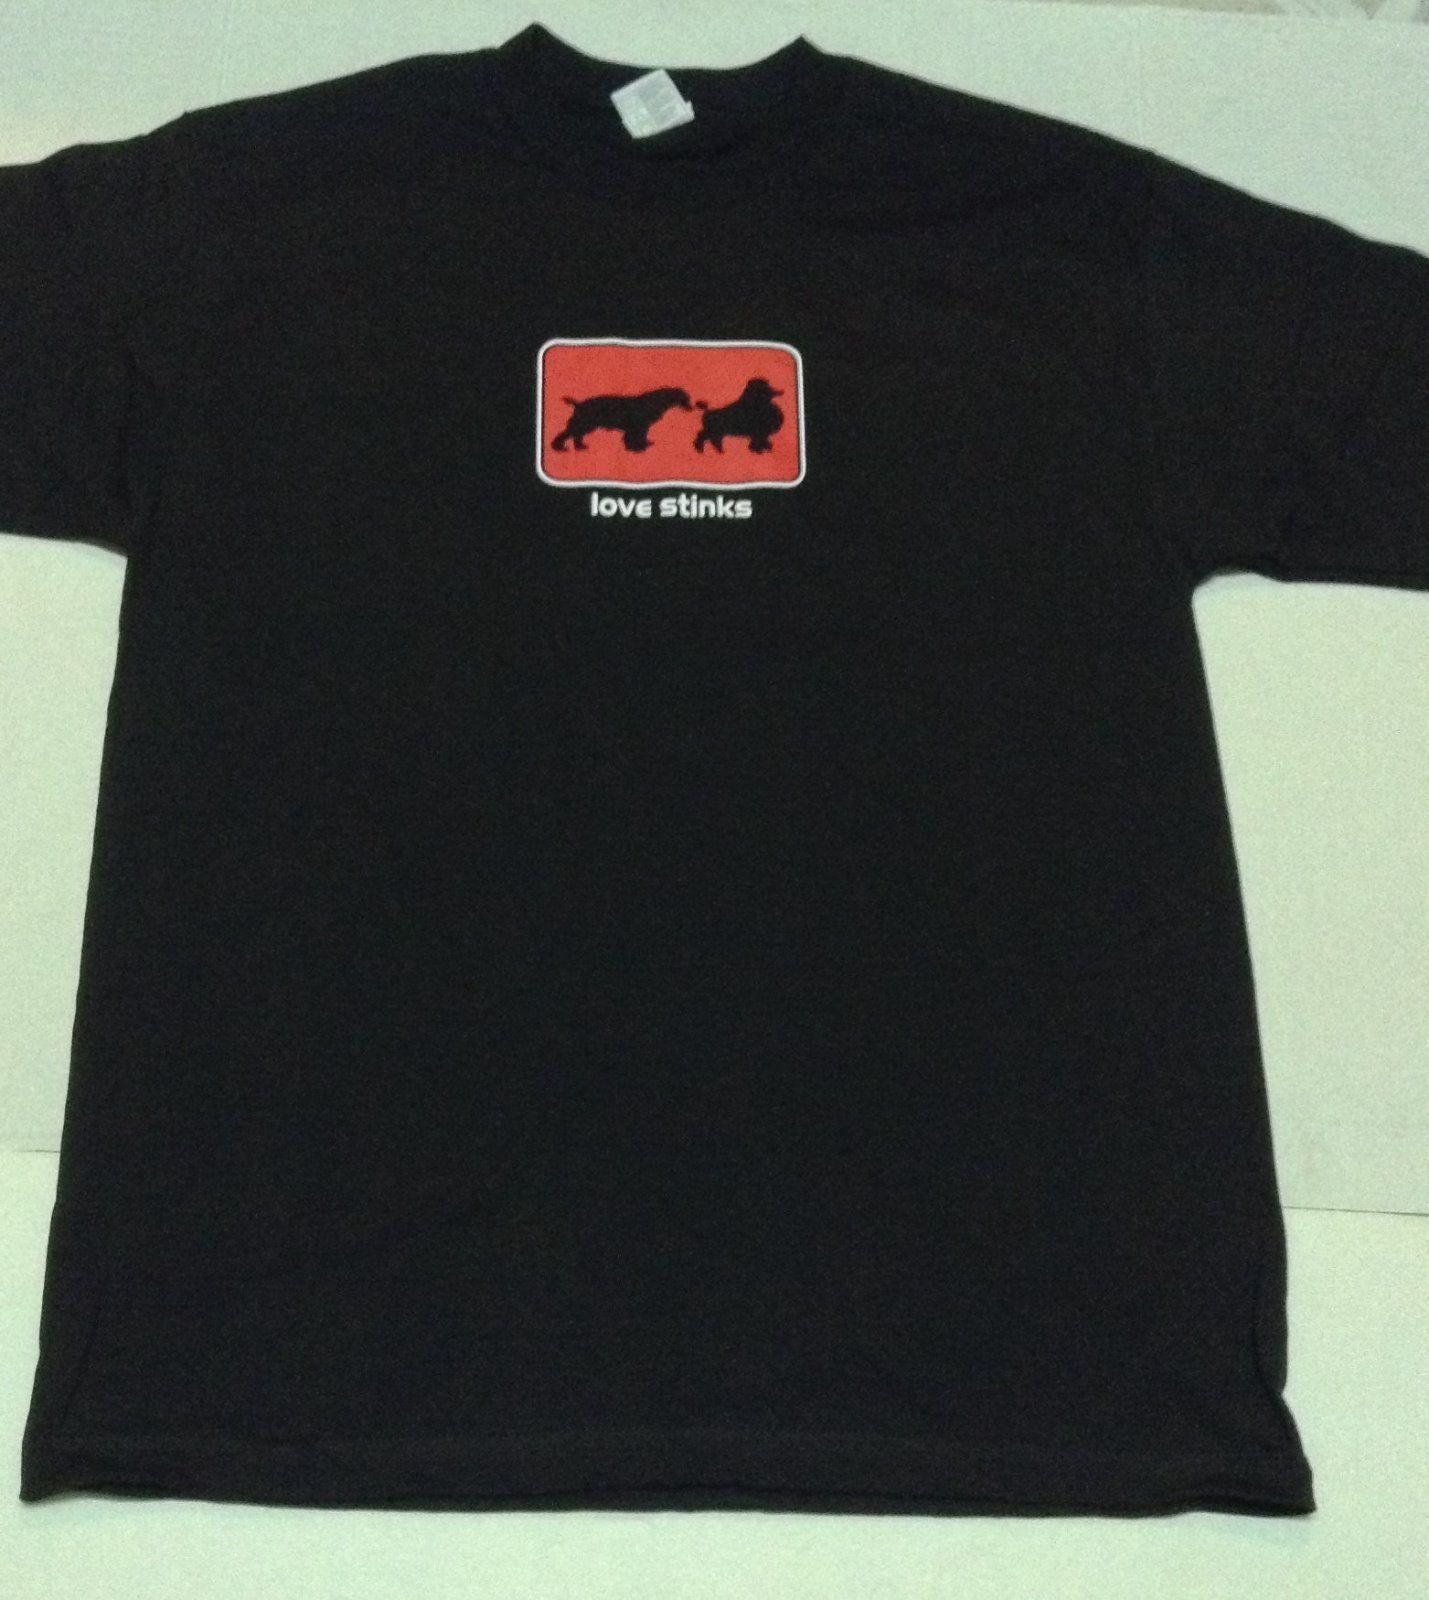 LOVE STINKS Black Short Sleeve TShirt NWOT Sz Adult Large